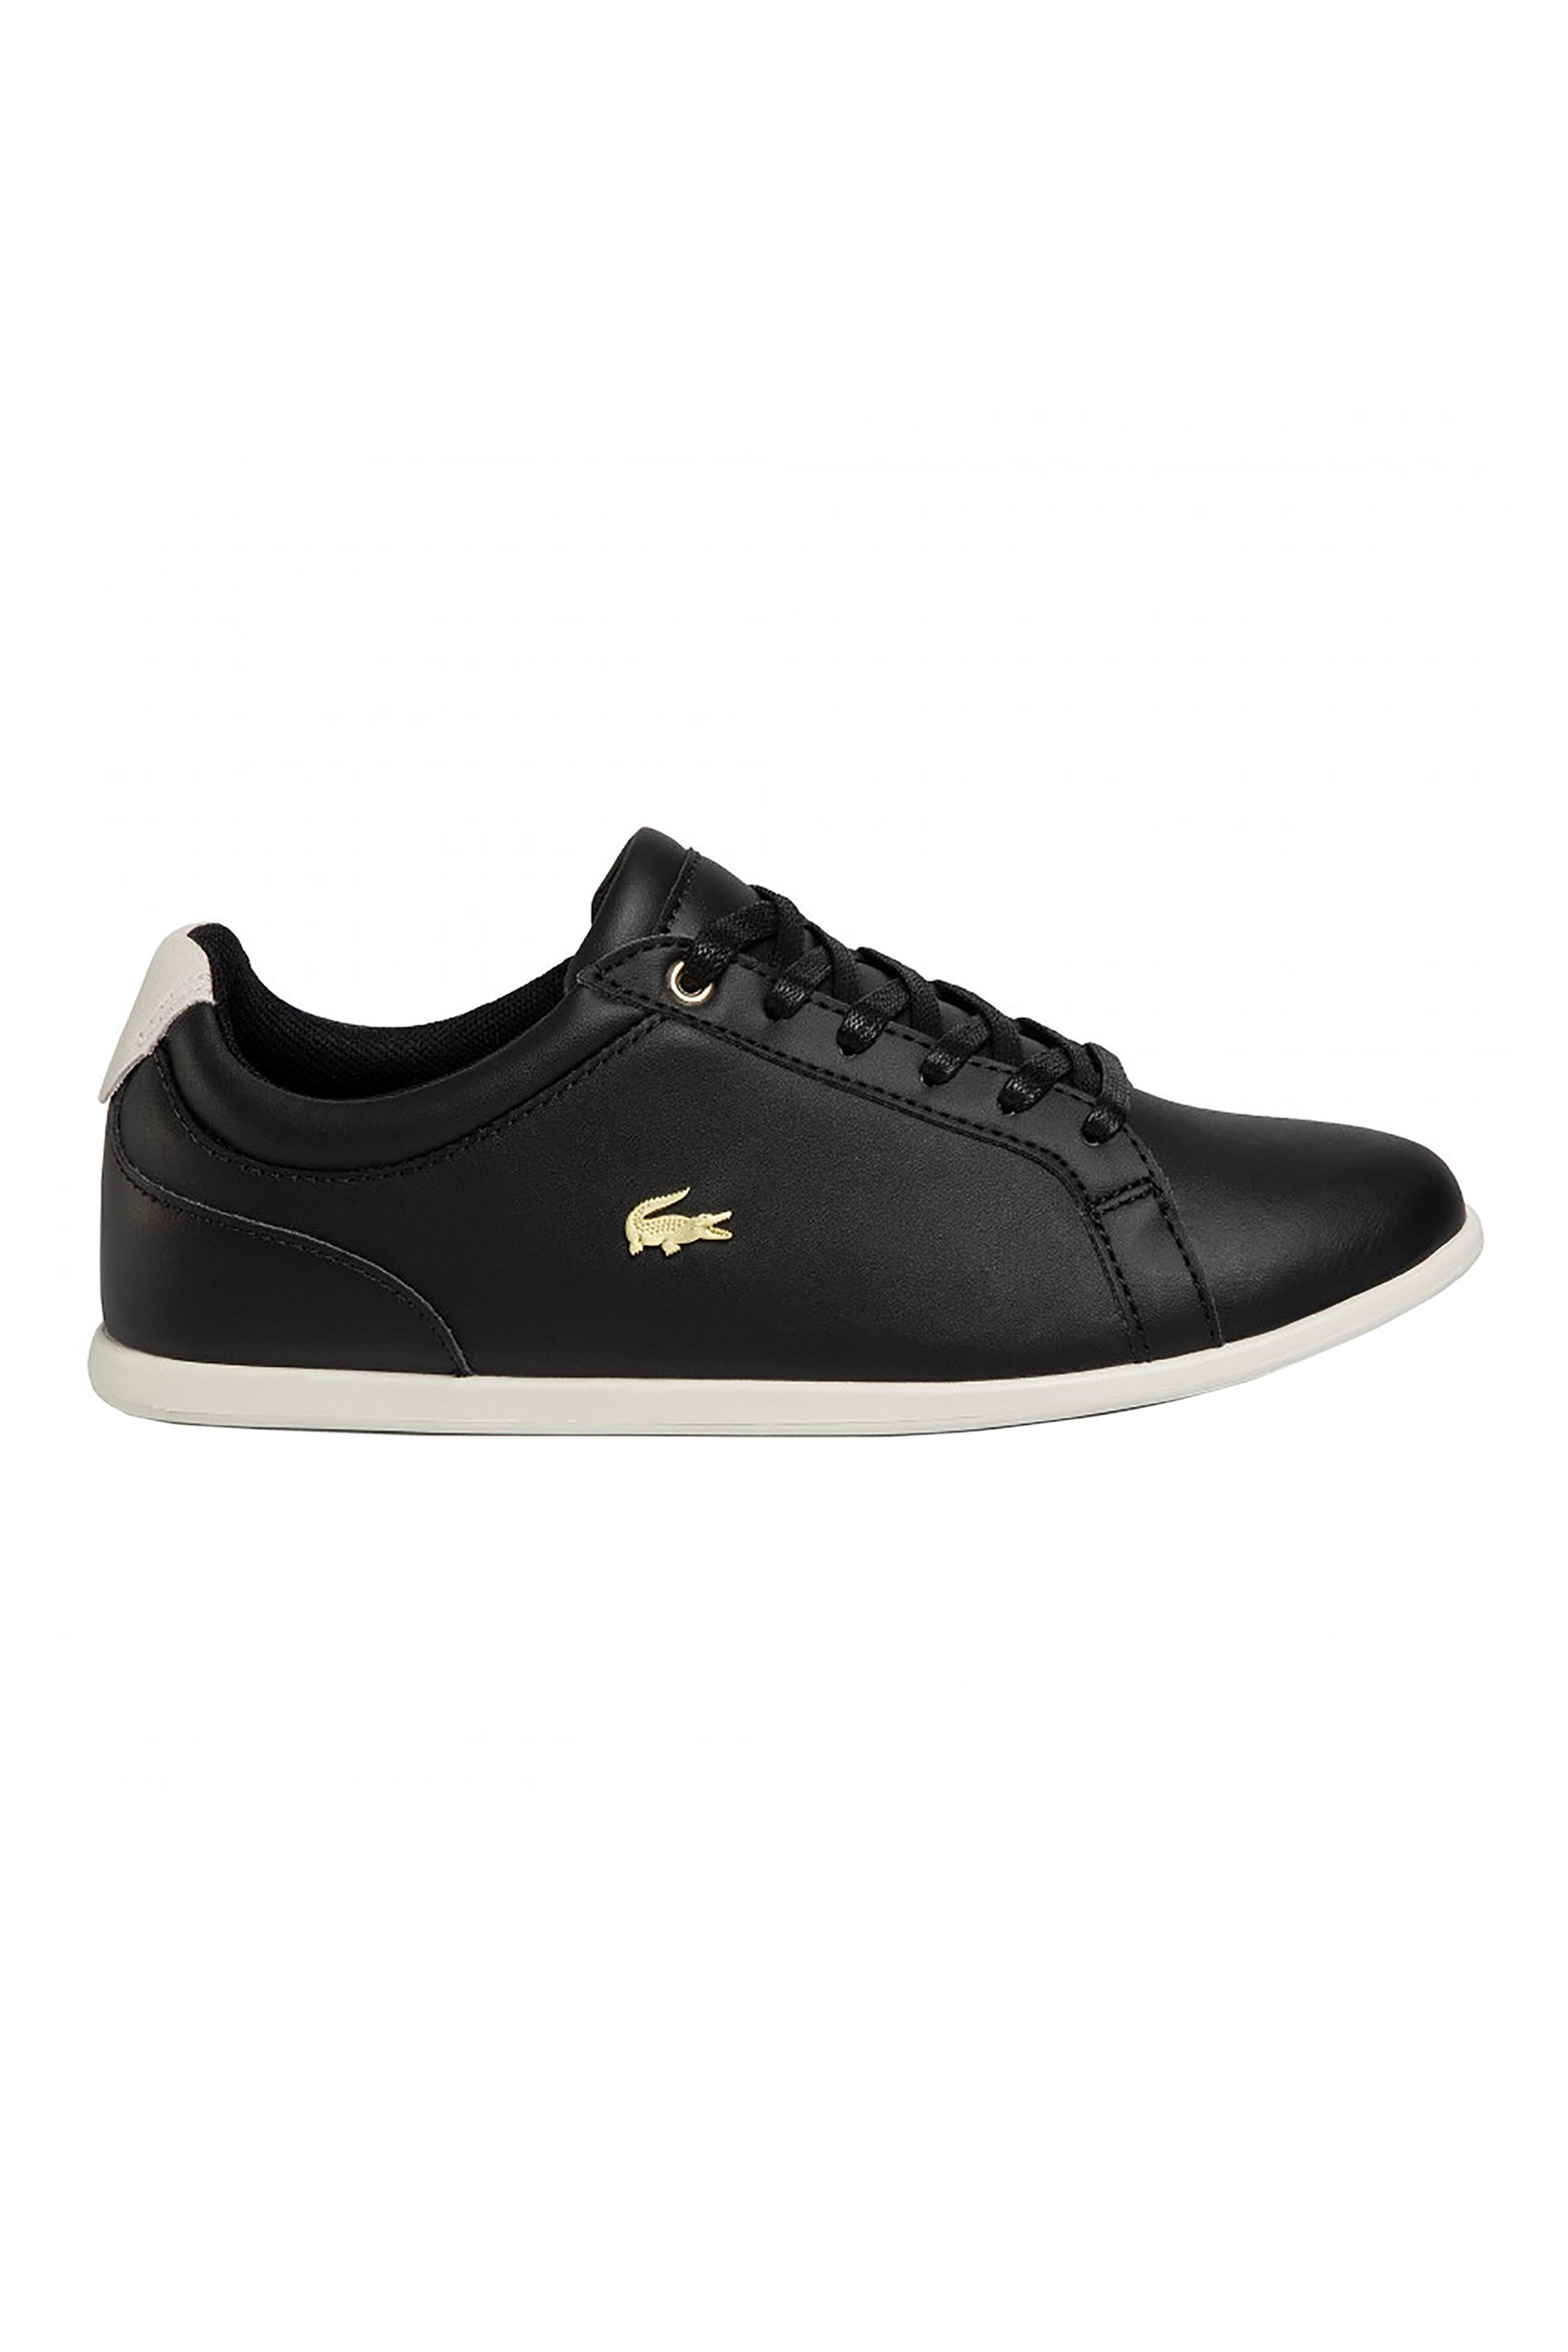 "Lacoste γυναικεία sneakers με μεταλλικό λογότυπο και λευκή σόλα ""Rey Lace 120"" – 39CFA0012454 – Μαύρο"